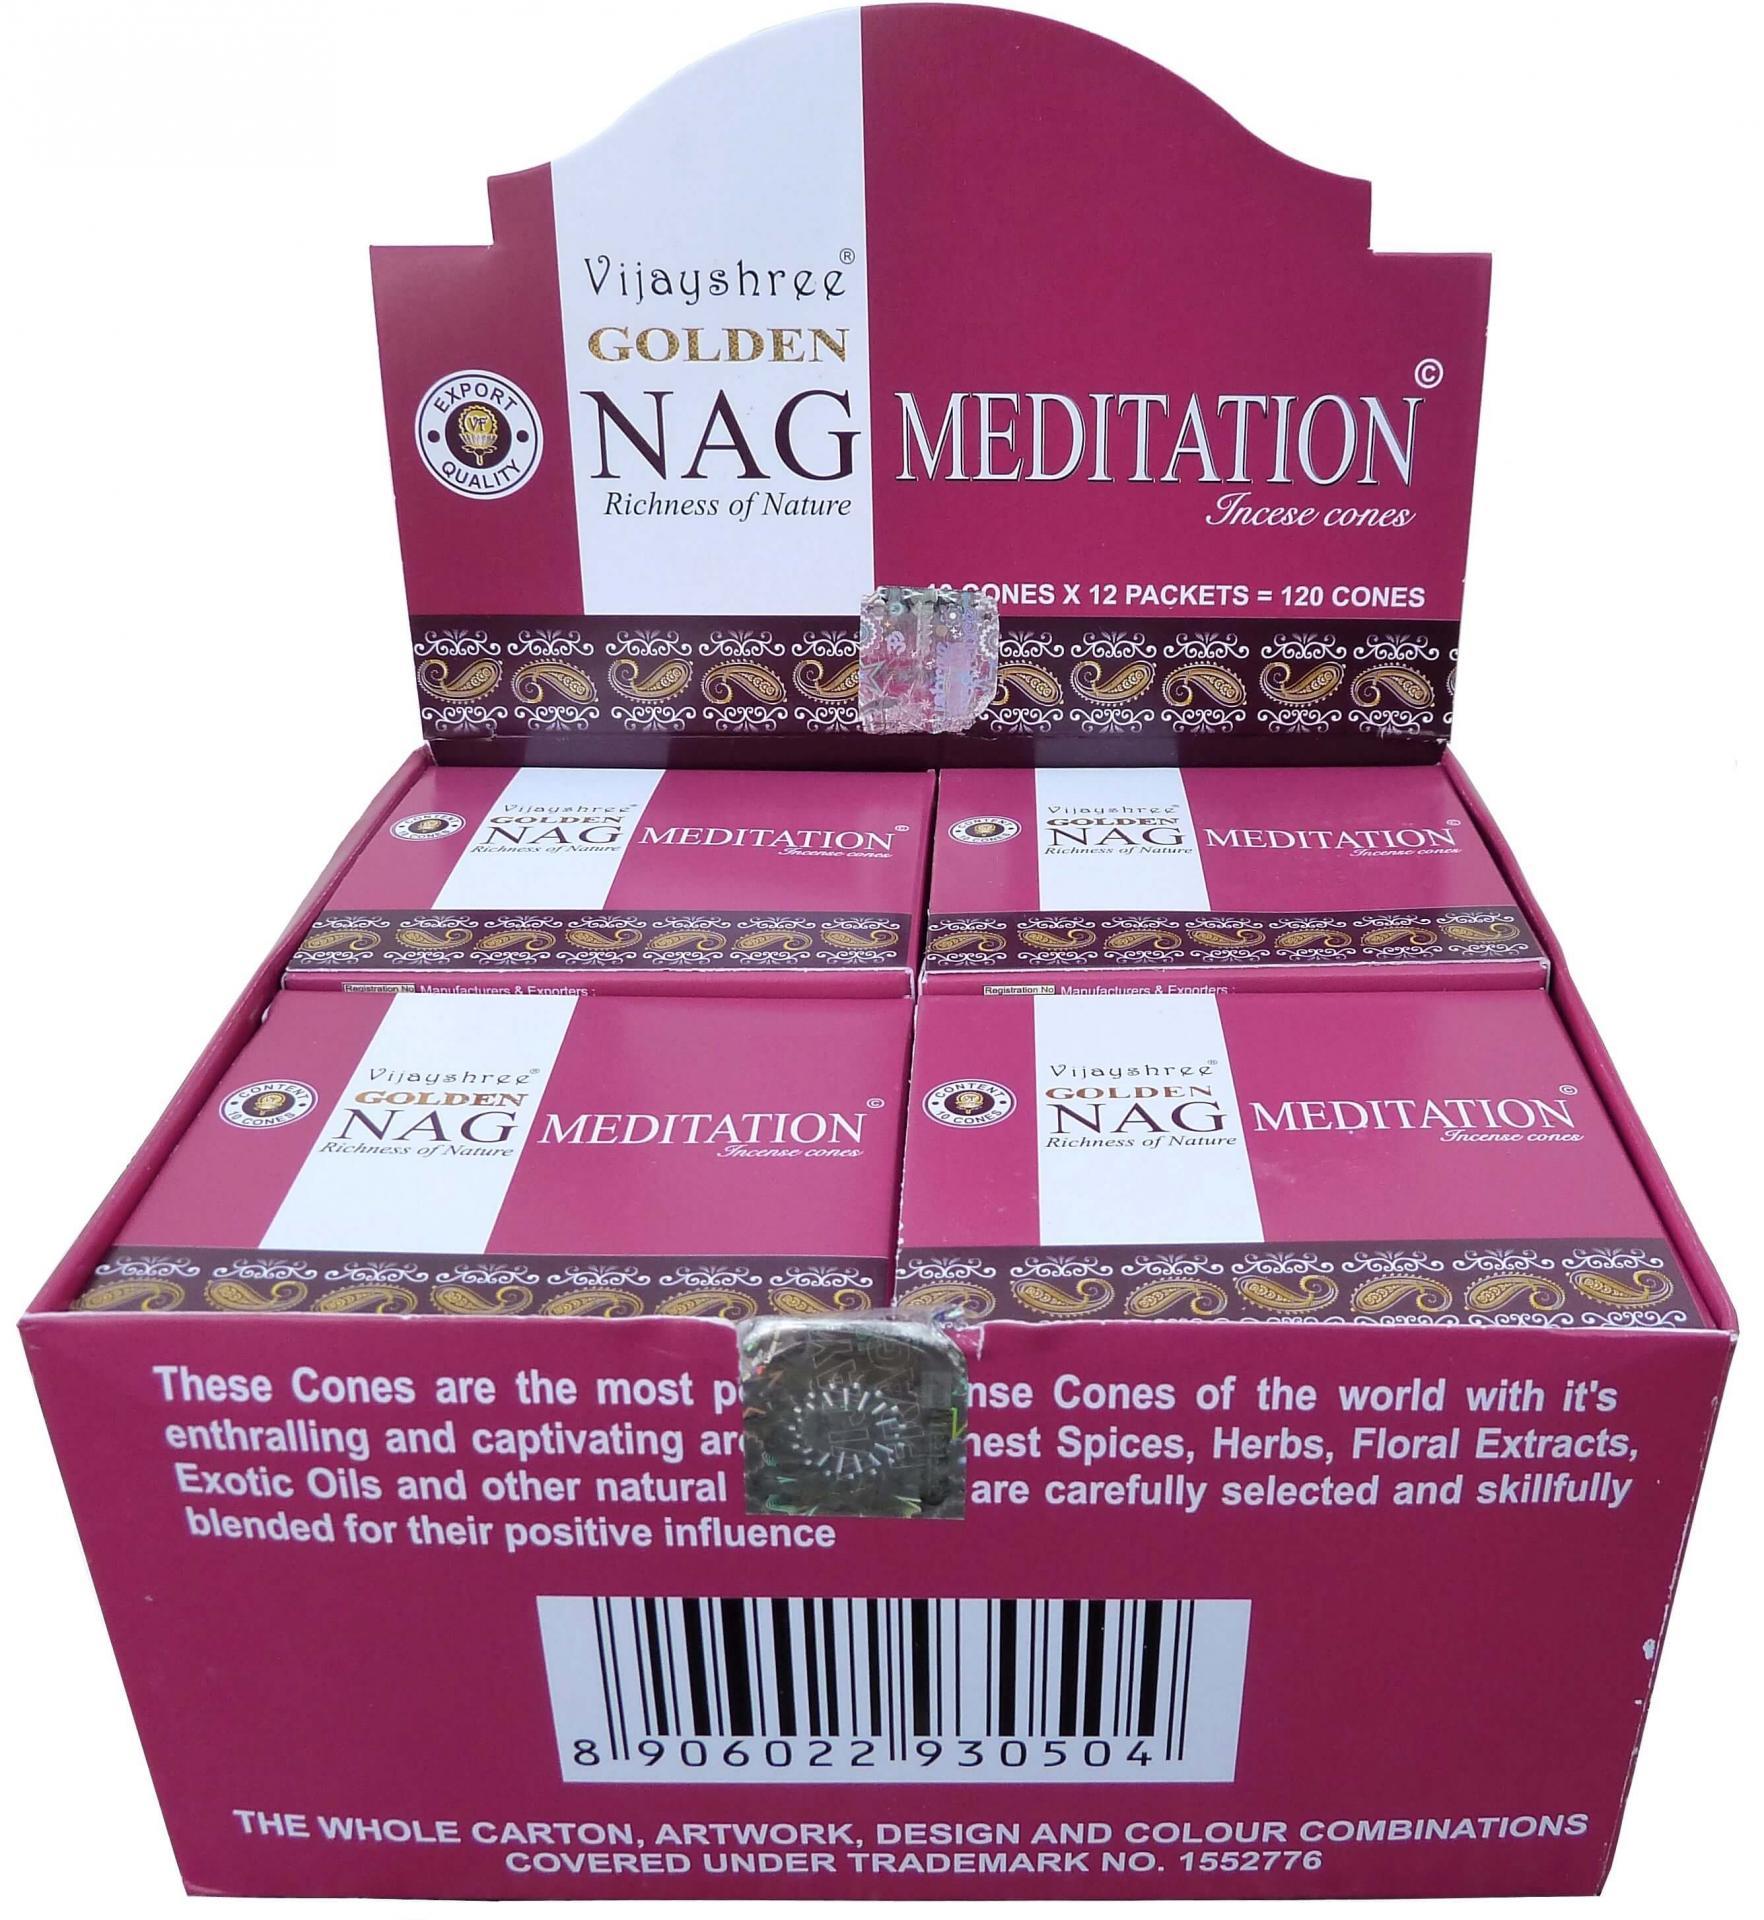 Nag méditation